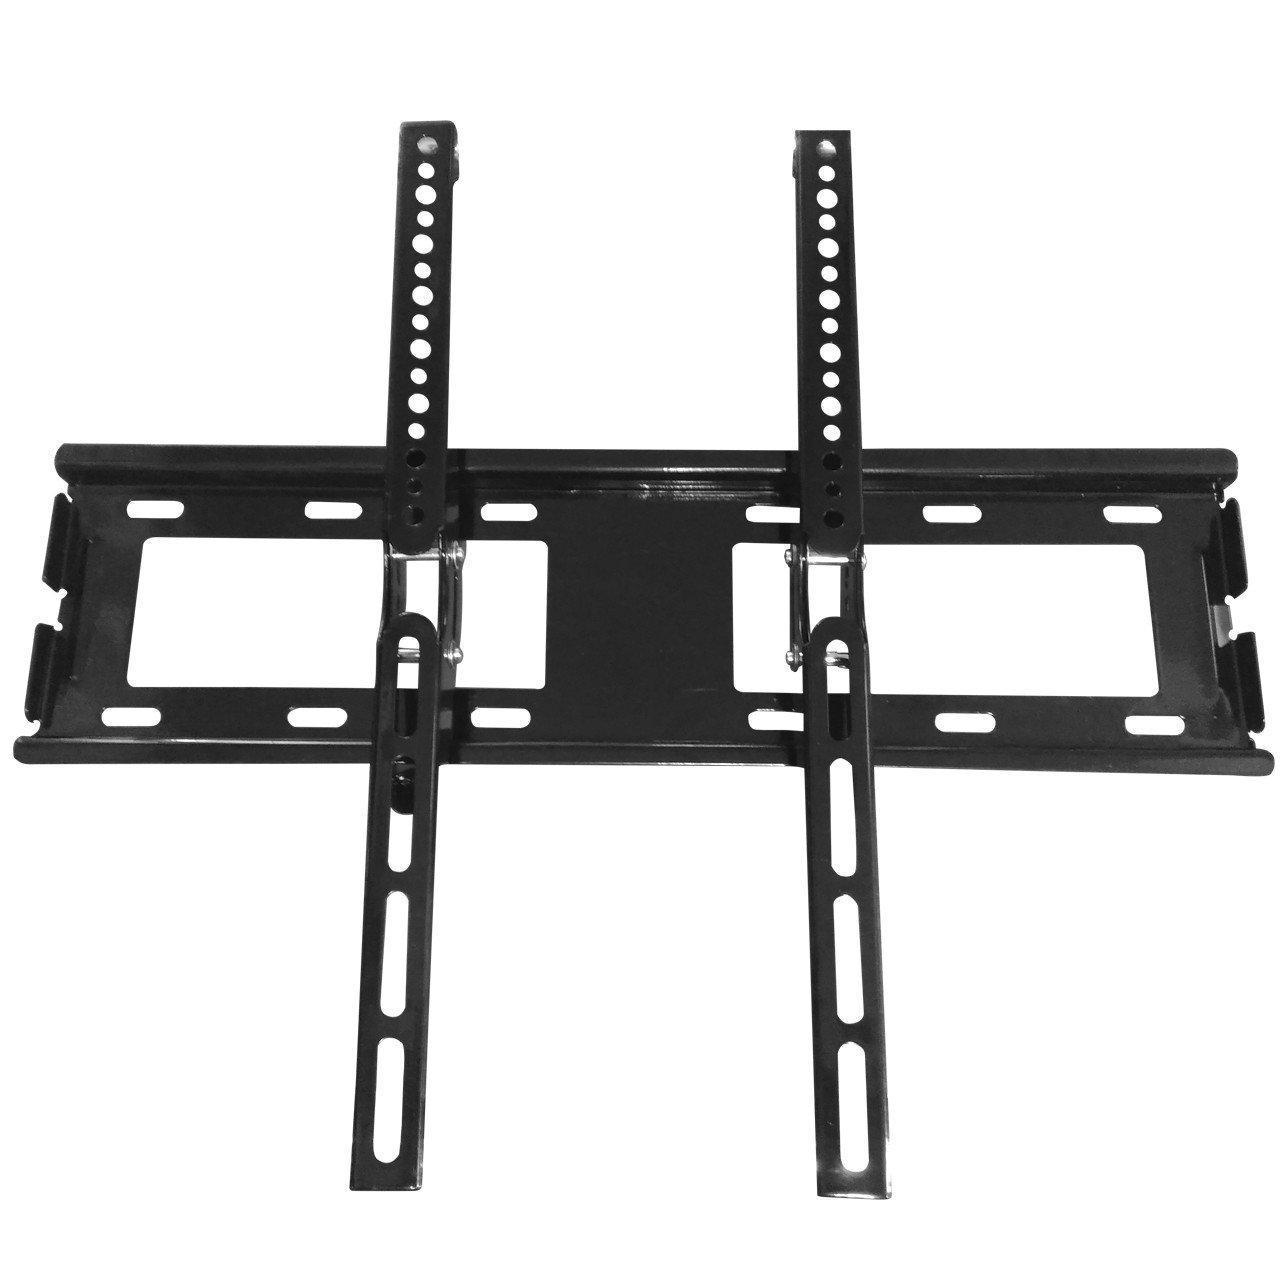 Кронштейн крепление для телевизора TV C45 от 26 до 55 дюймов